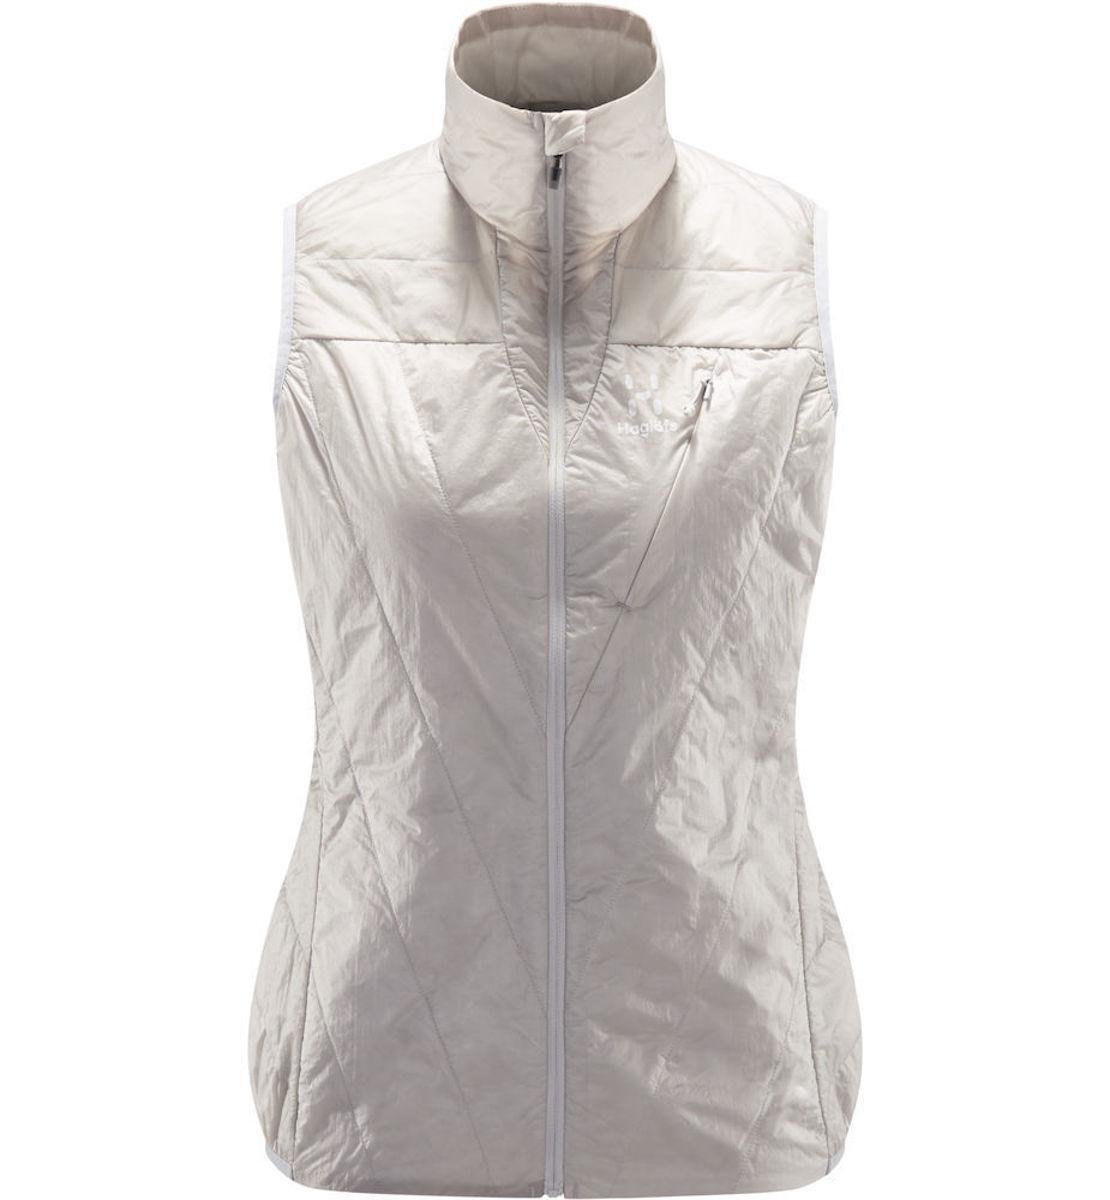 Bilde av Haglöfs  L.I.M Barrier Vest Women 3X3 Stone Grey